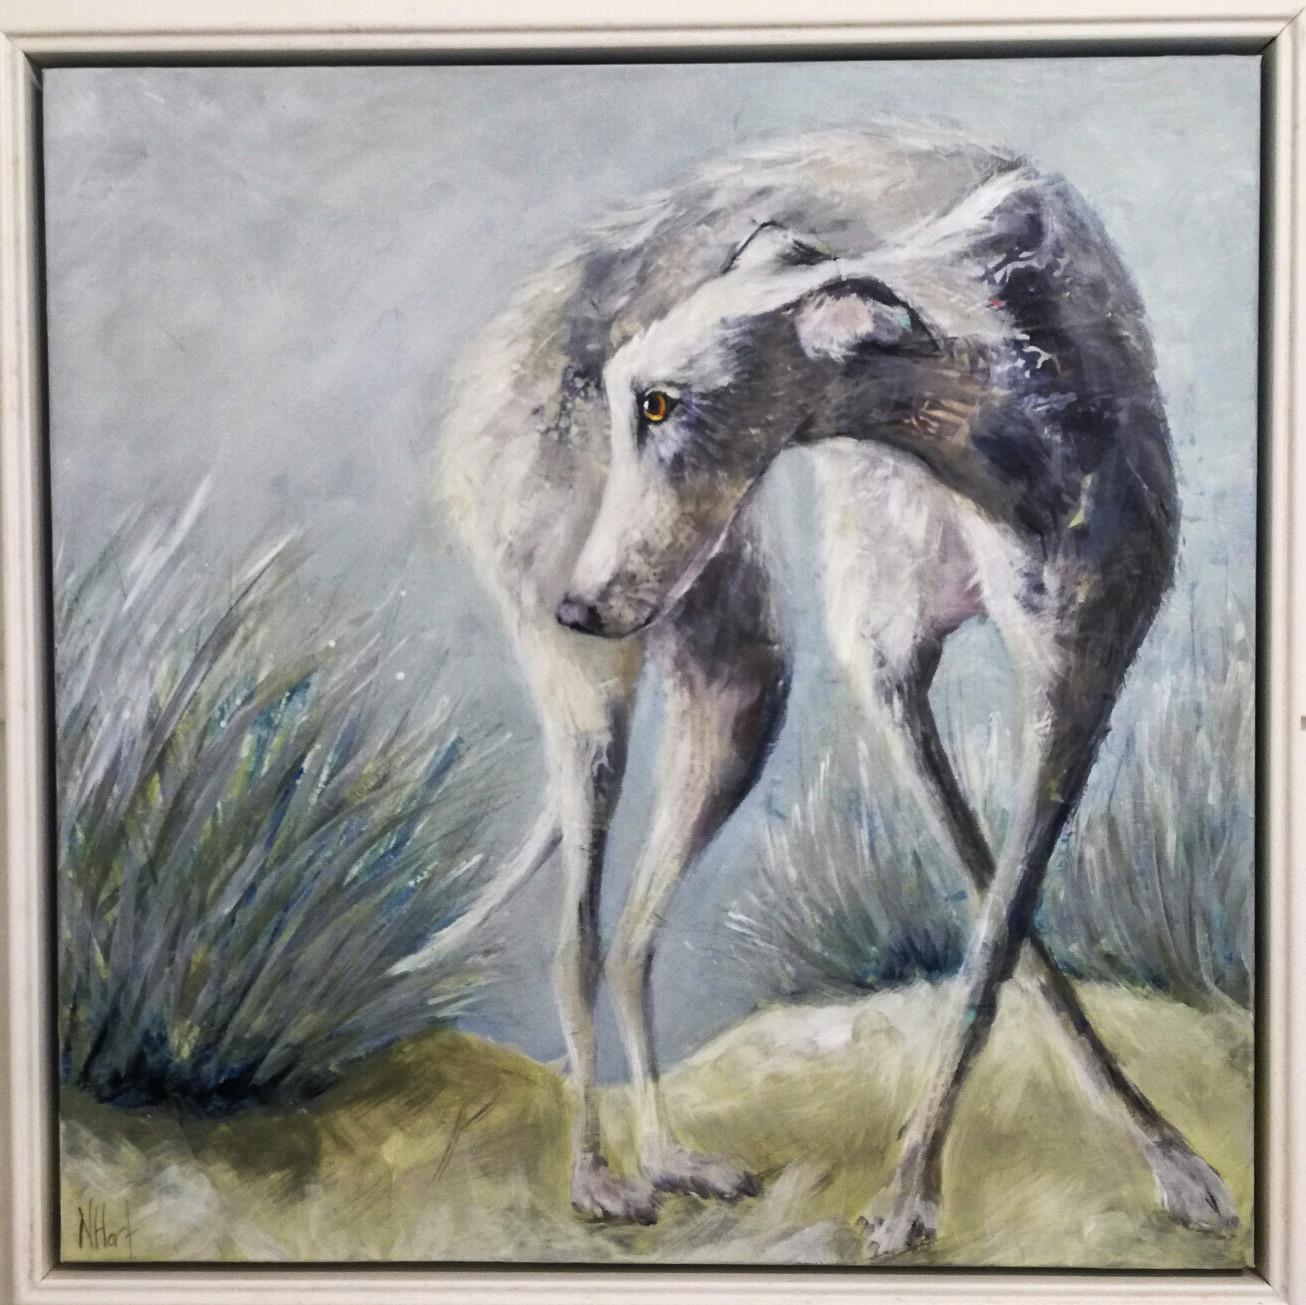 Holkham Hound  mixed media  54.5 x 54.5 cm  sold